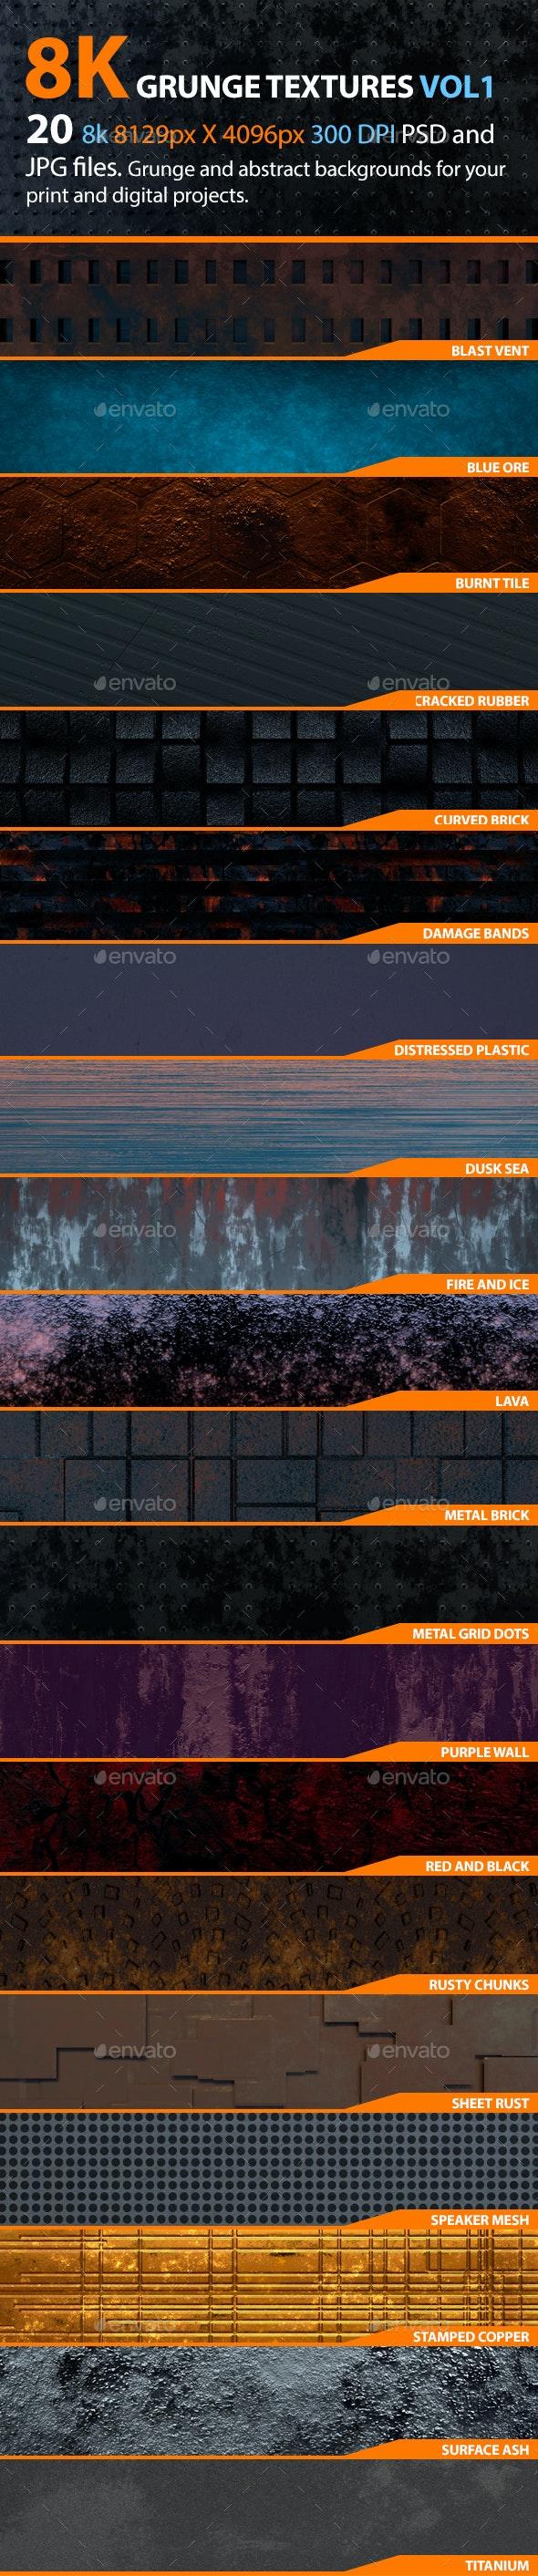 8K Grunge Textures Volume 1 - Textures